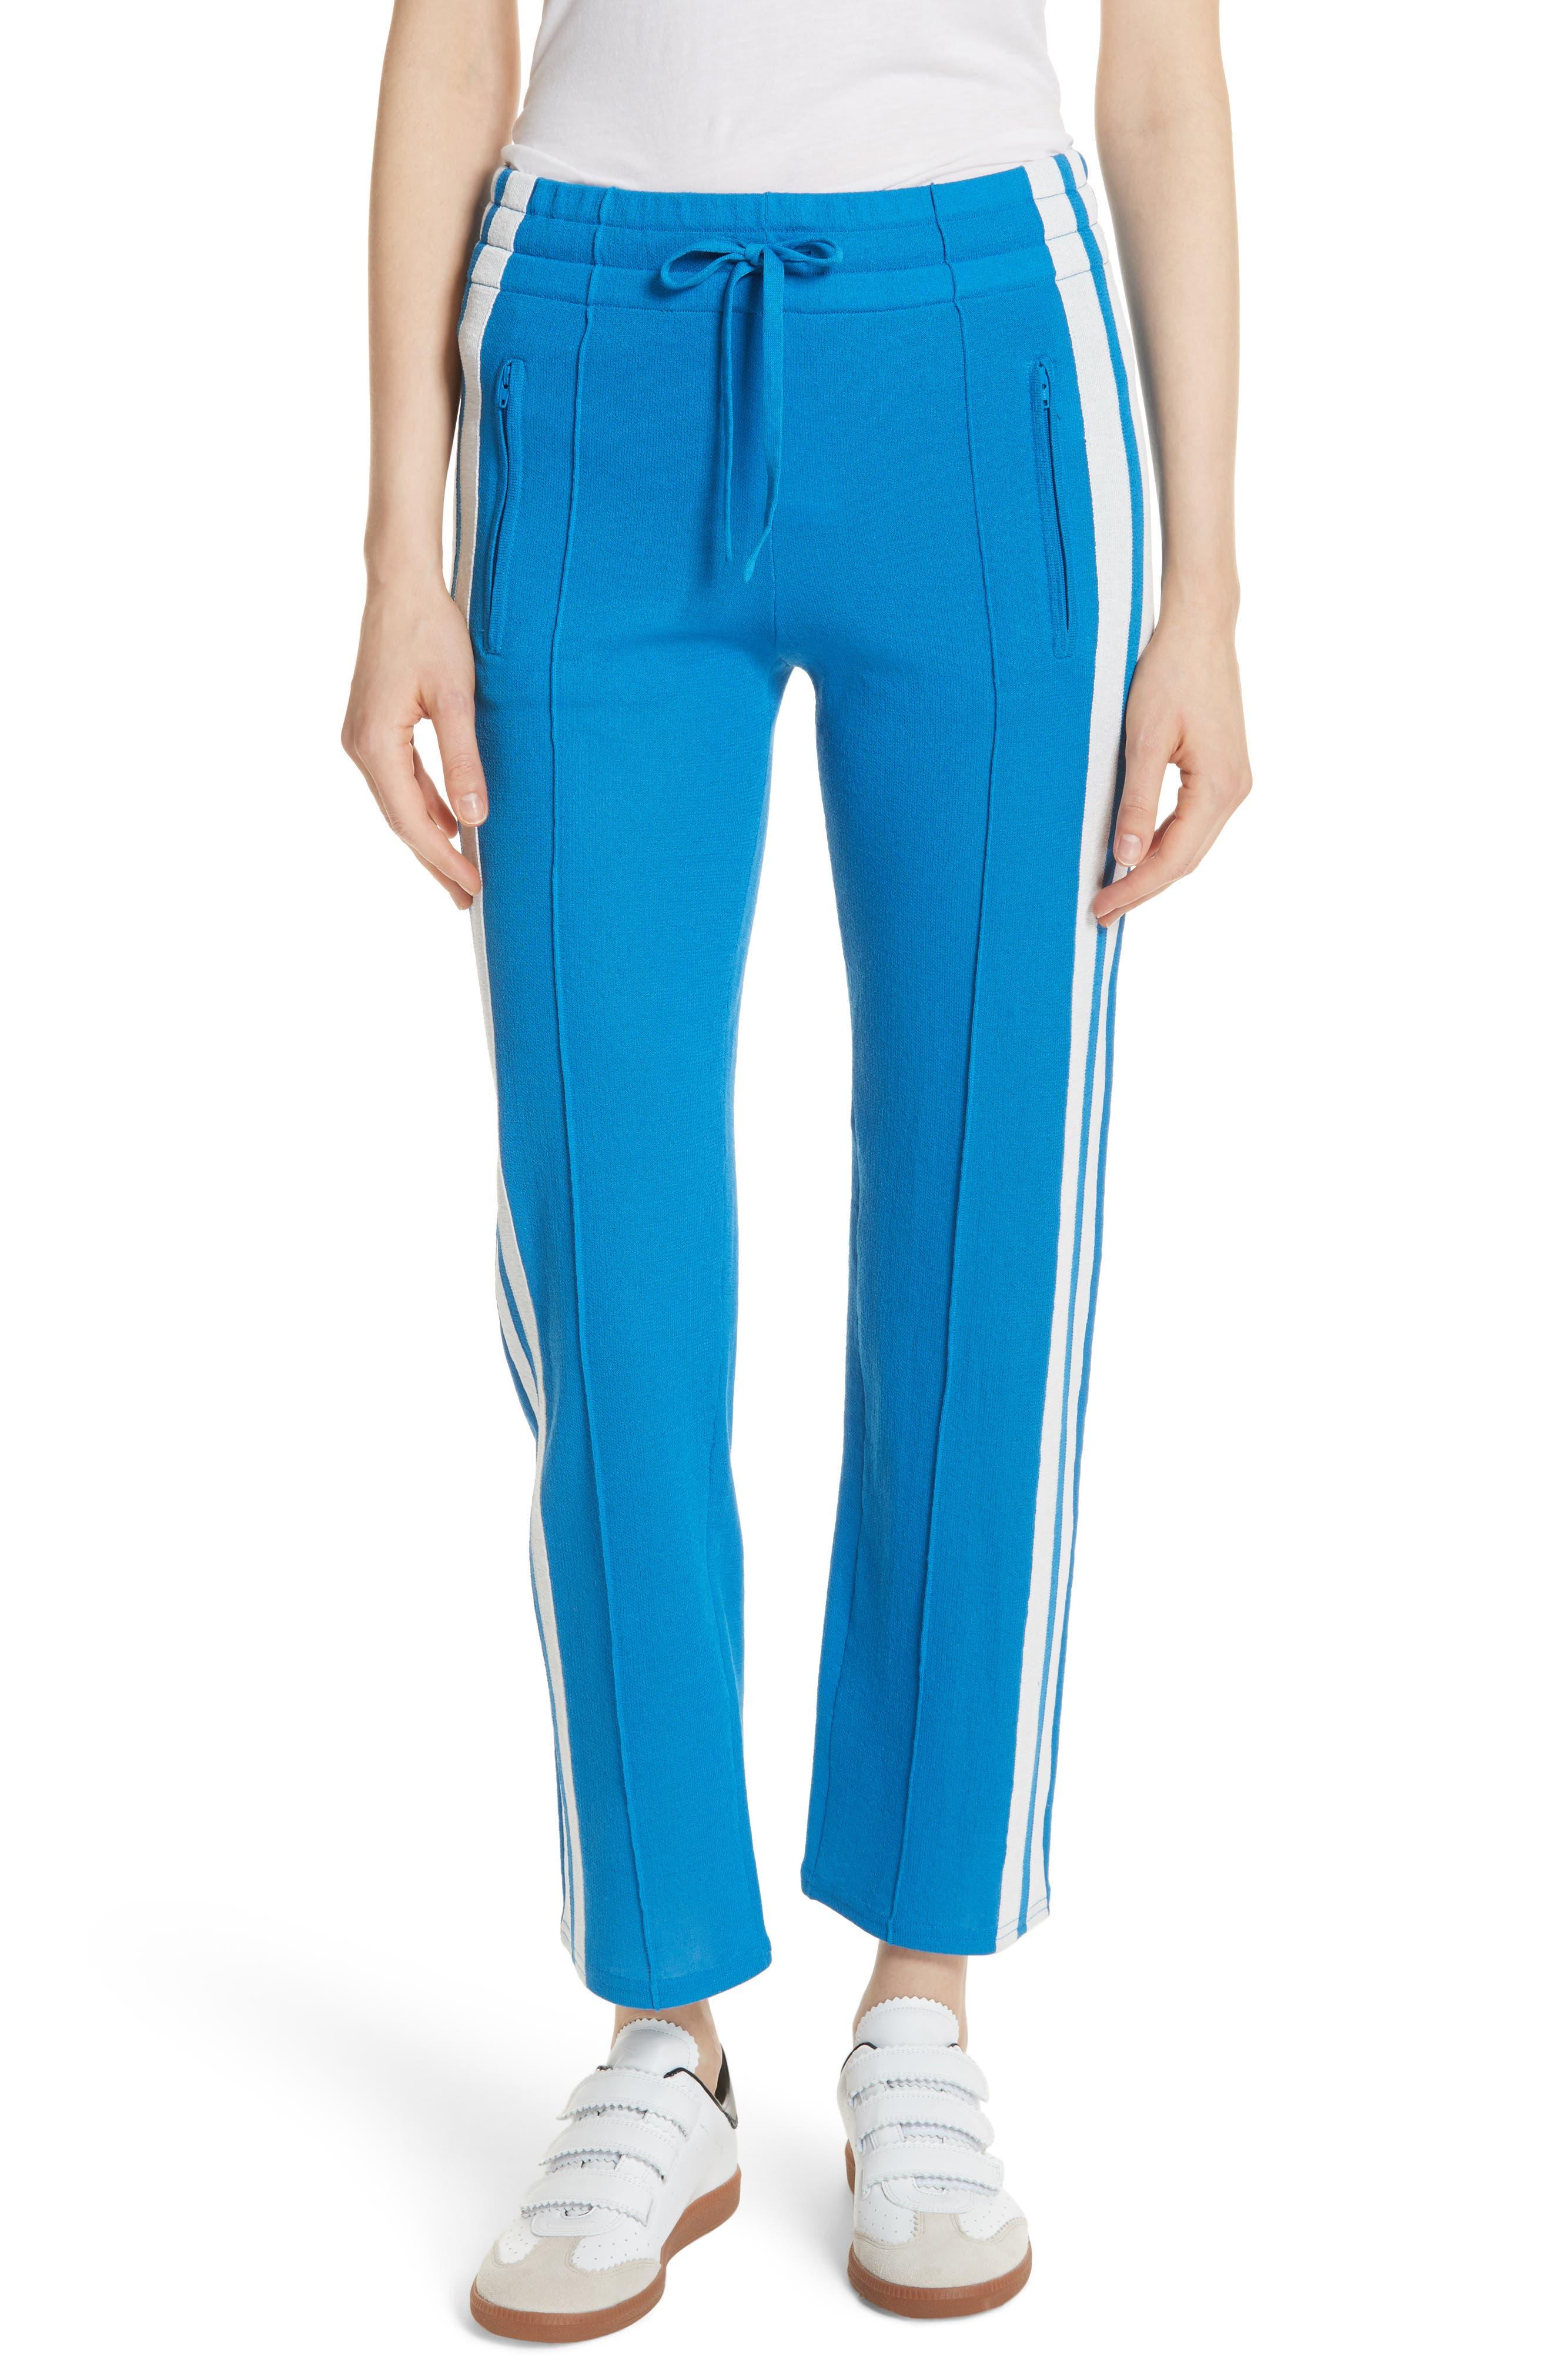 Isabel Marant Étoile Dobbs Pants,                             Main thumbnail 1, color,                             Electric Blue